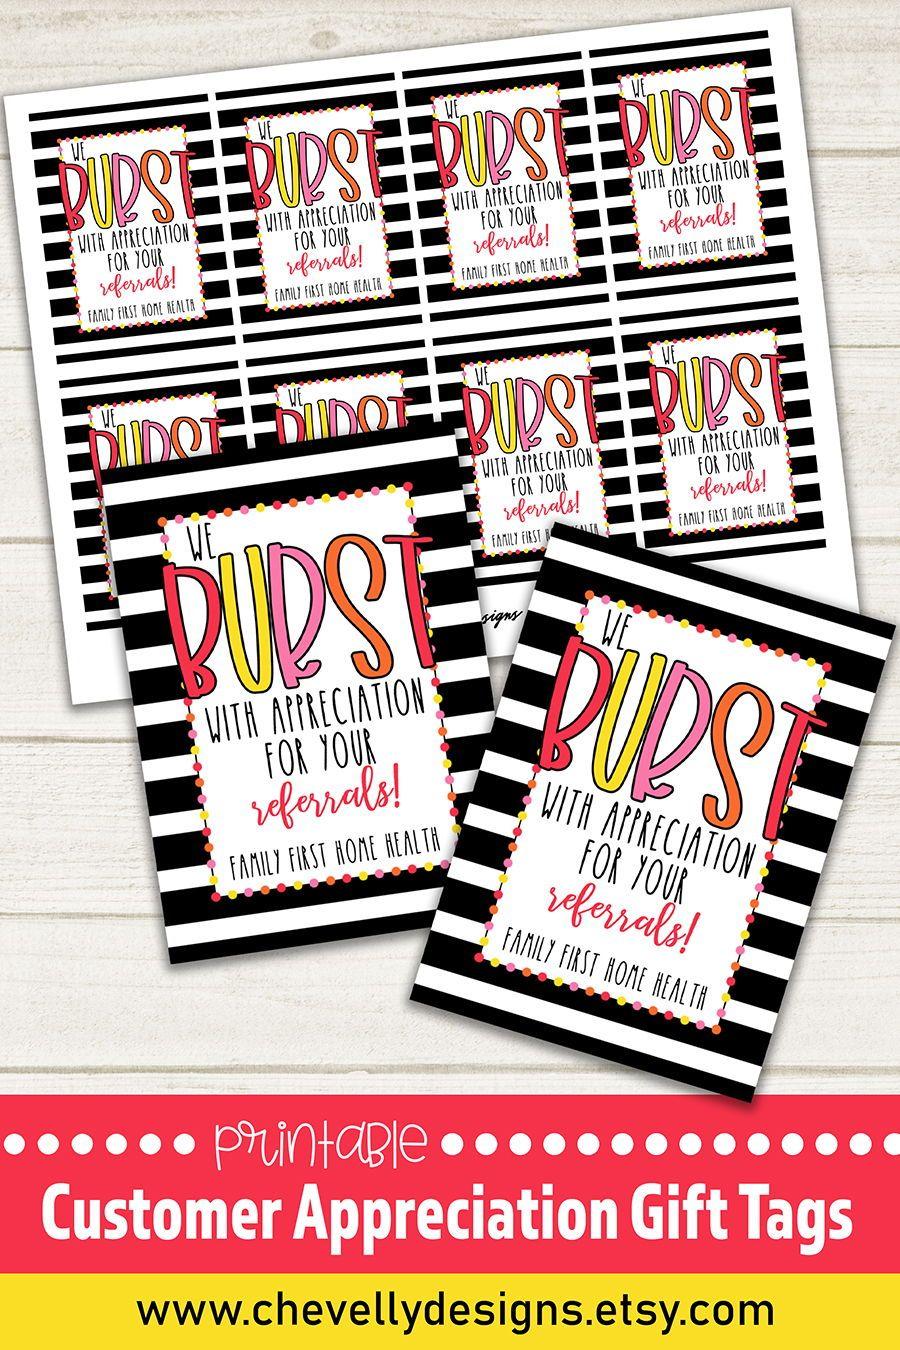 Customer appreciation gift tags printable and